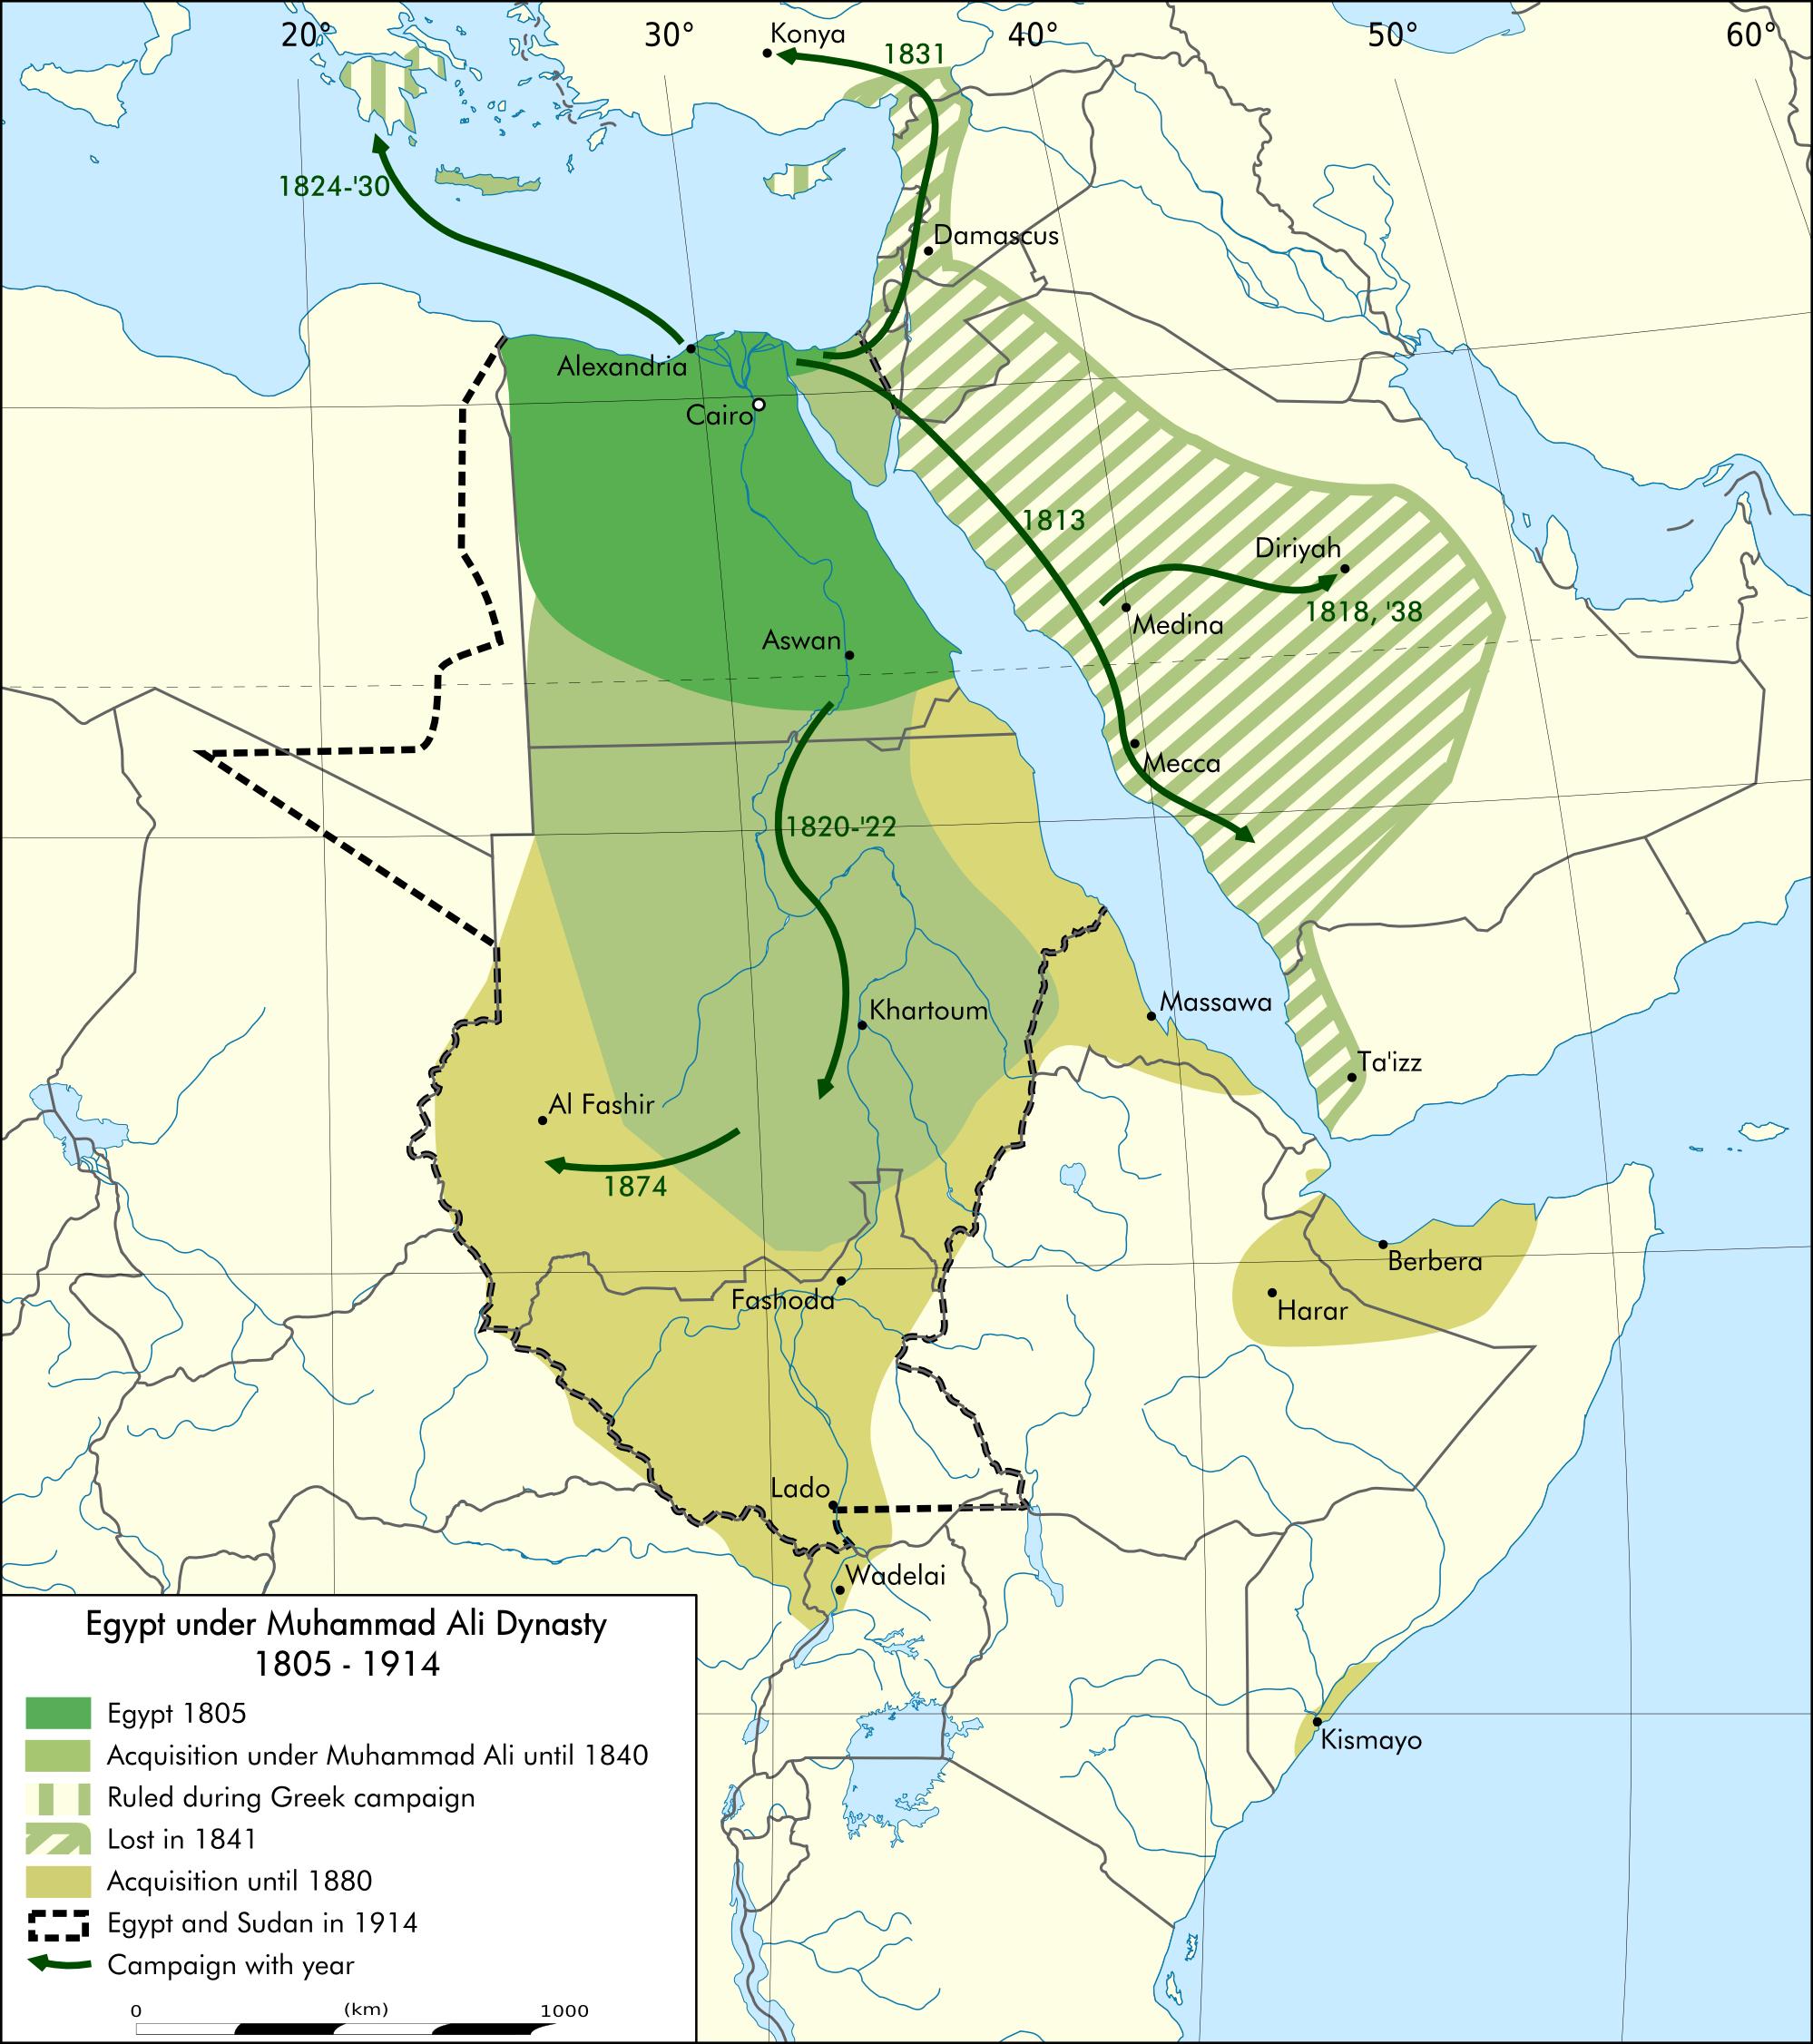 file egypt under muhammad ali map de png g o maps egypt Egypt History Map file egypt under muhammad ali map de png g o maps egypt pinterest egypt history pdf